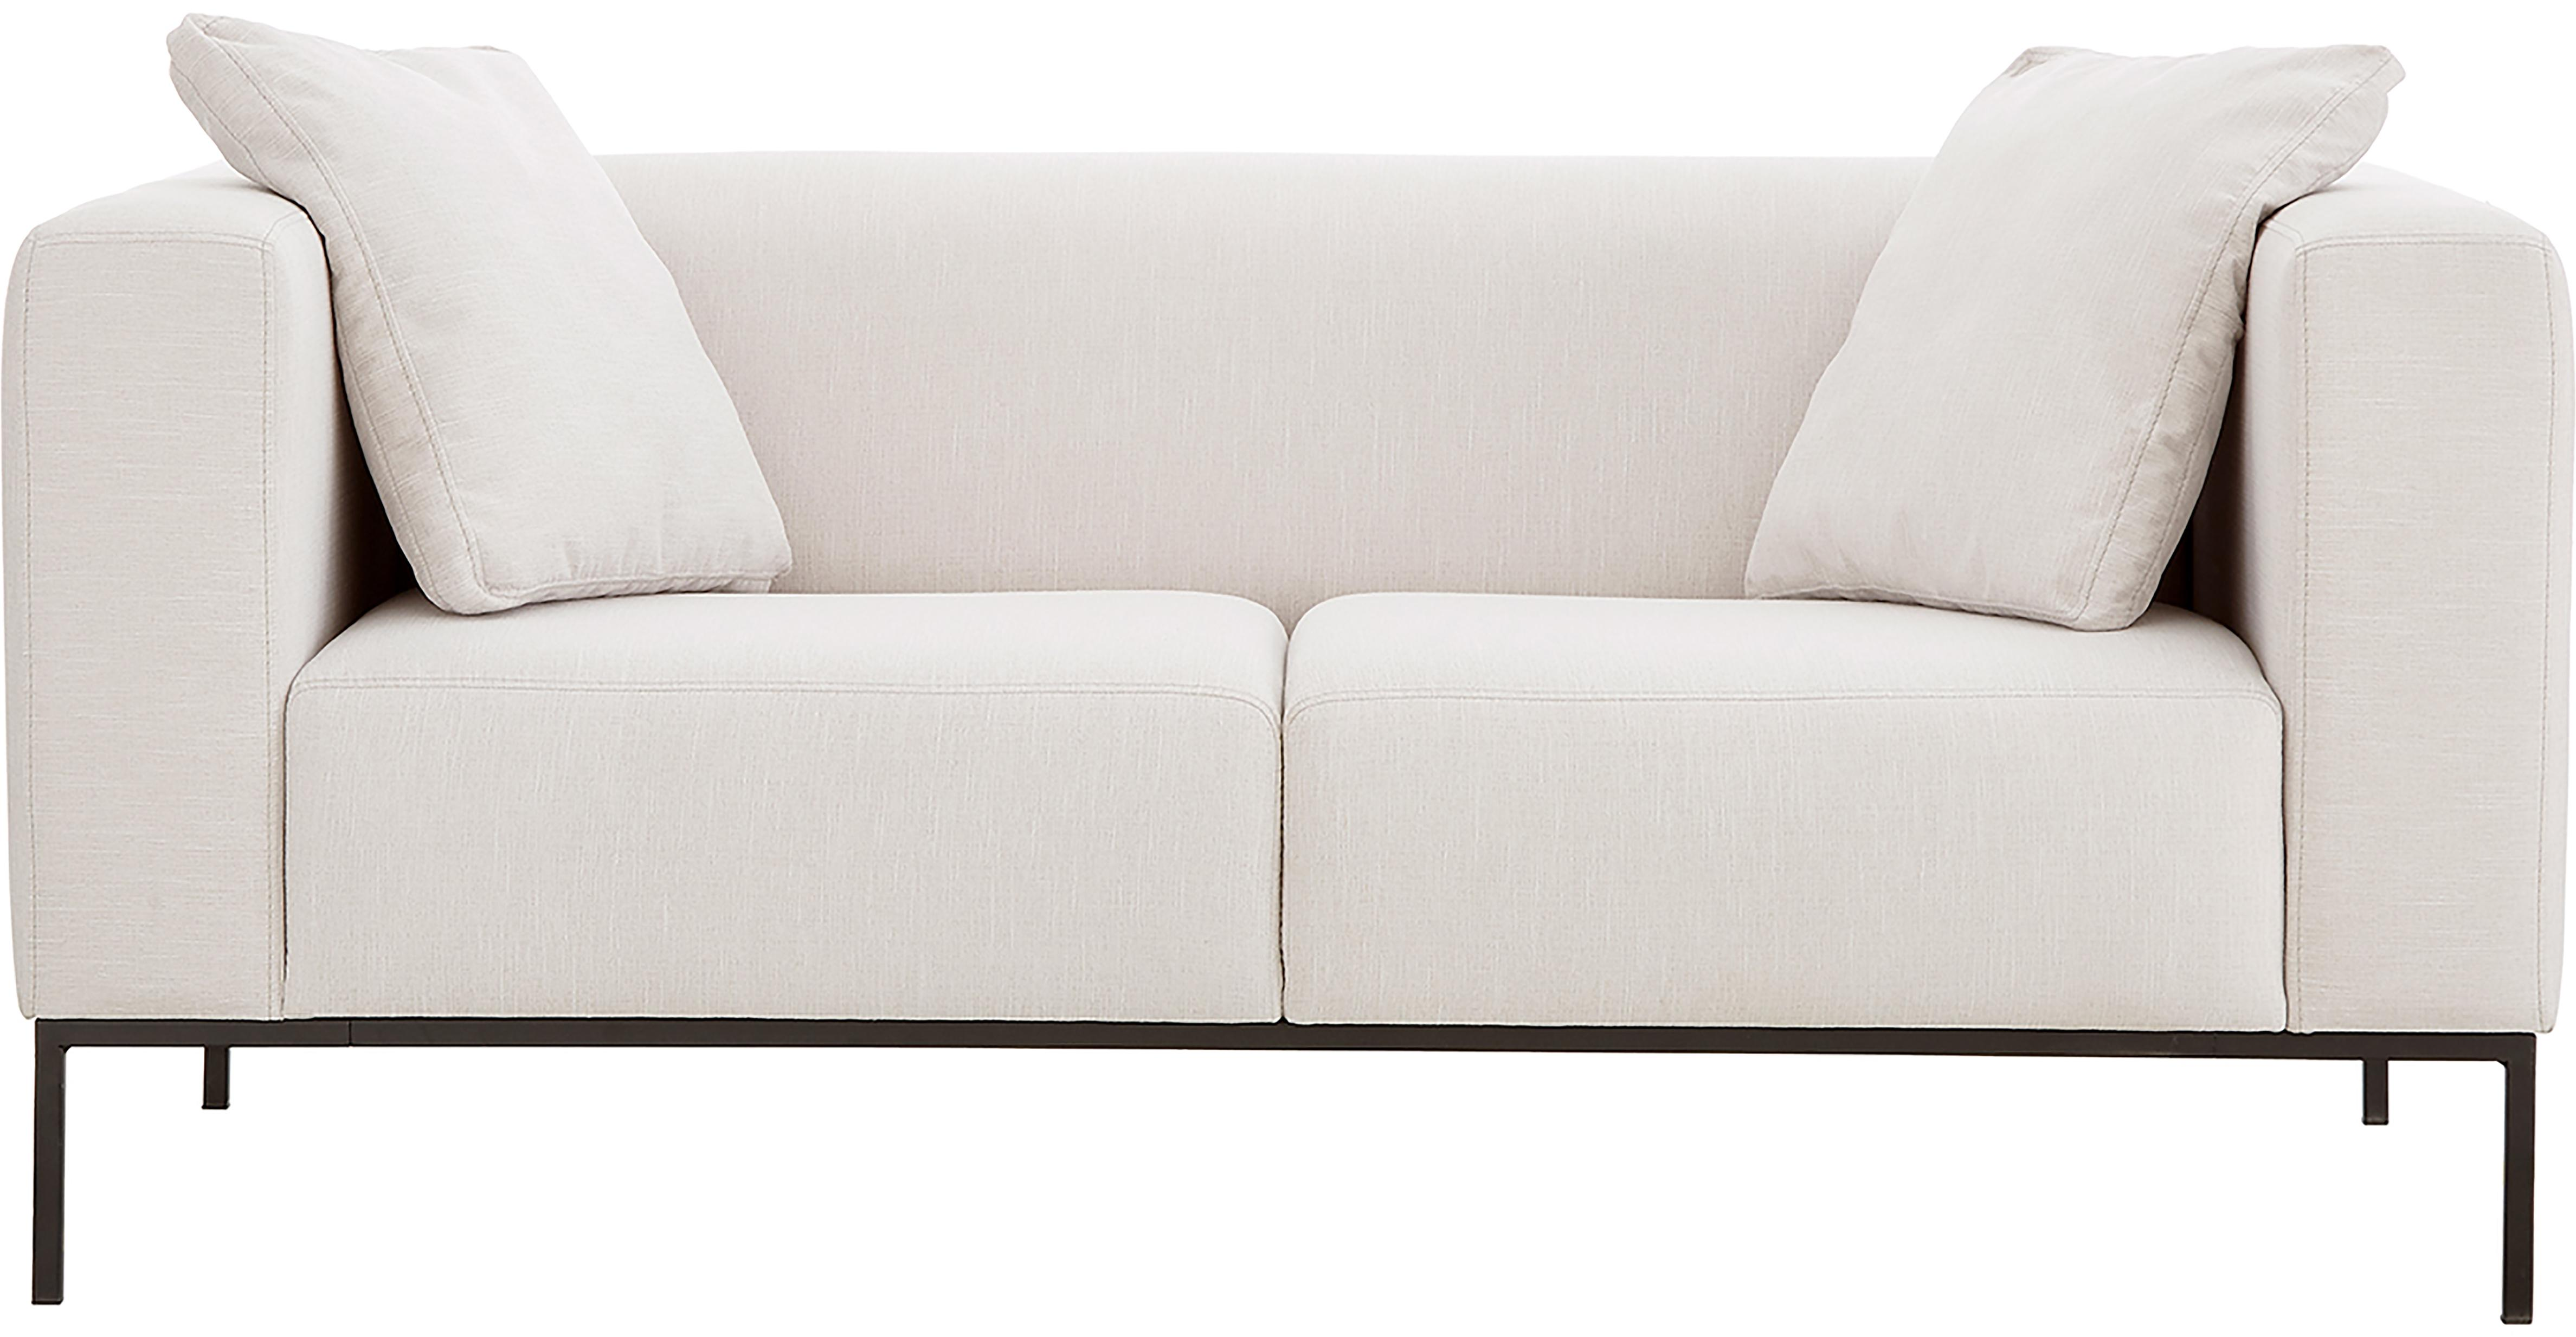 Sofa Carrie (2-Sitzer), Bezug: Polyester 50.000 Scheuert, Gestell: Spanholz, Hartfaserplatte, Webstoff Beige, B 176 x T 86 cm